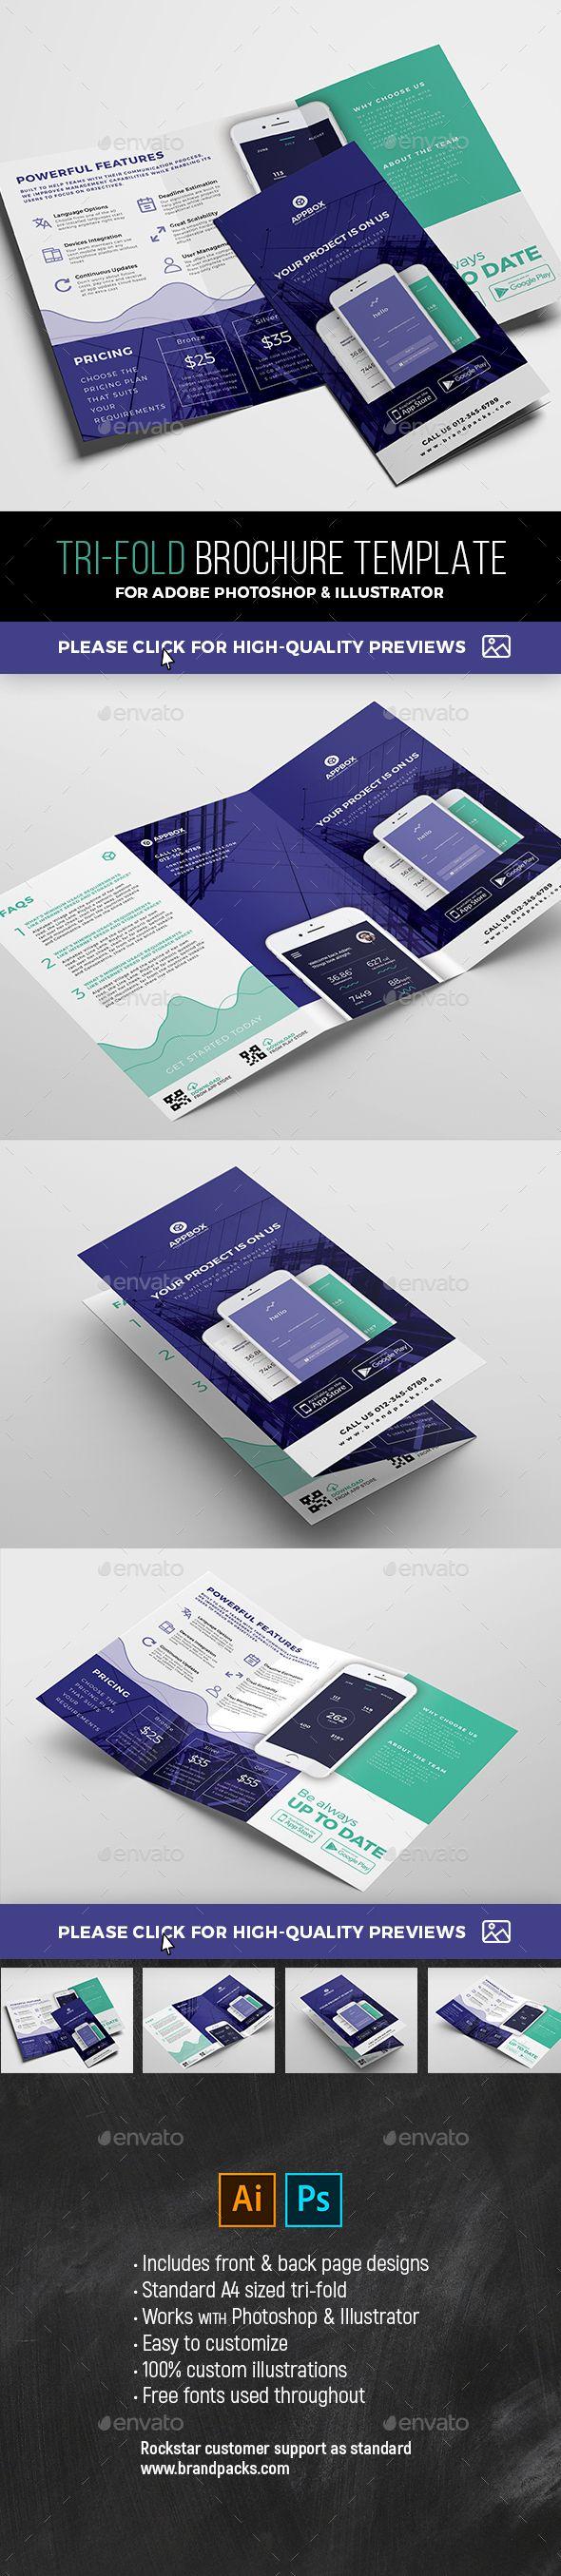 Mobile App Tri Fold Brochure Corporate Brochures Brochure